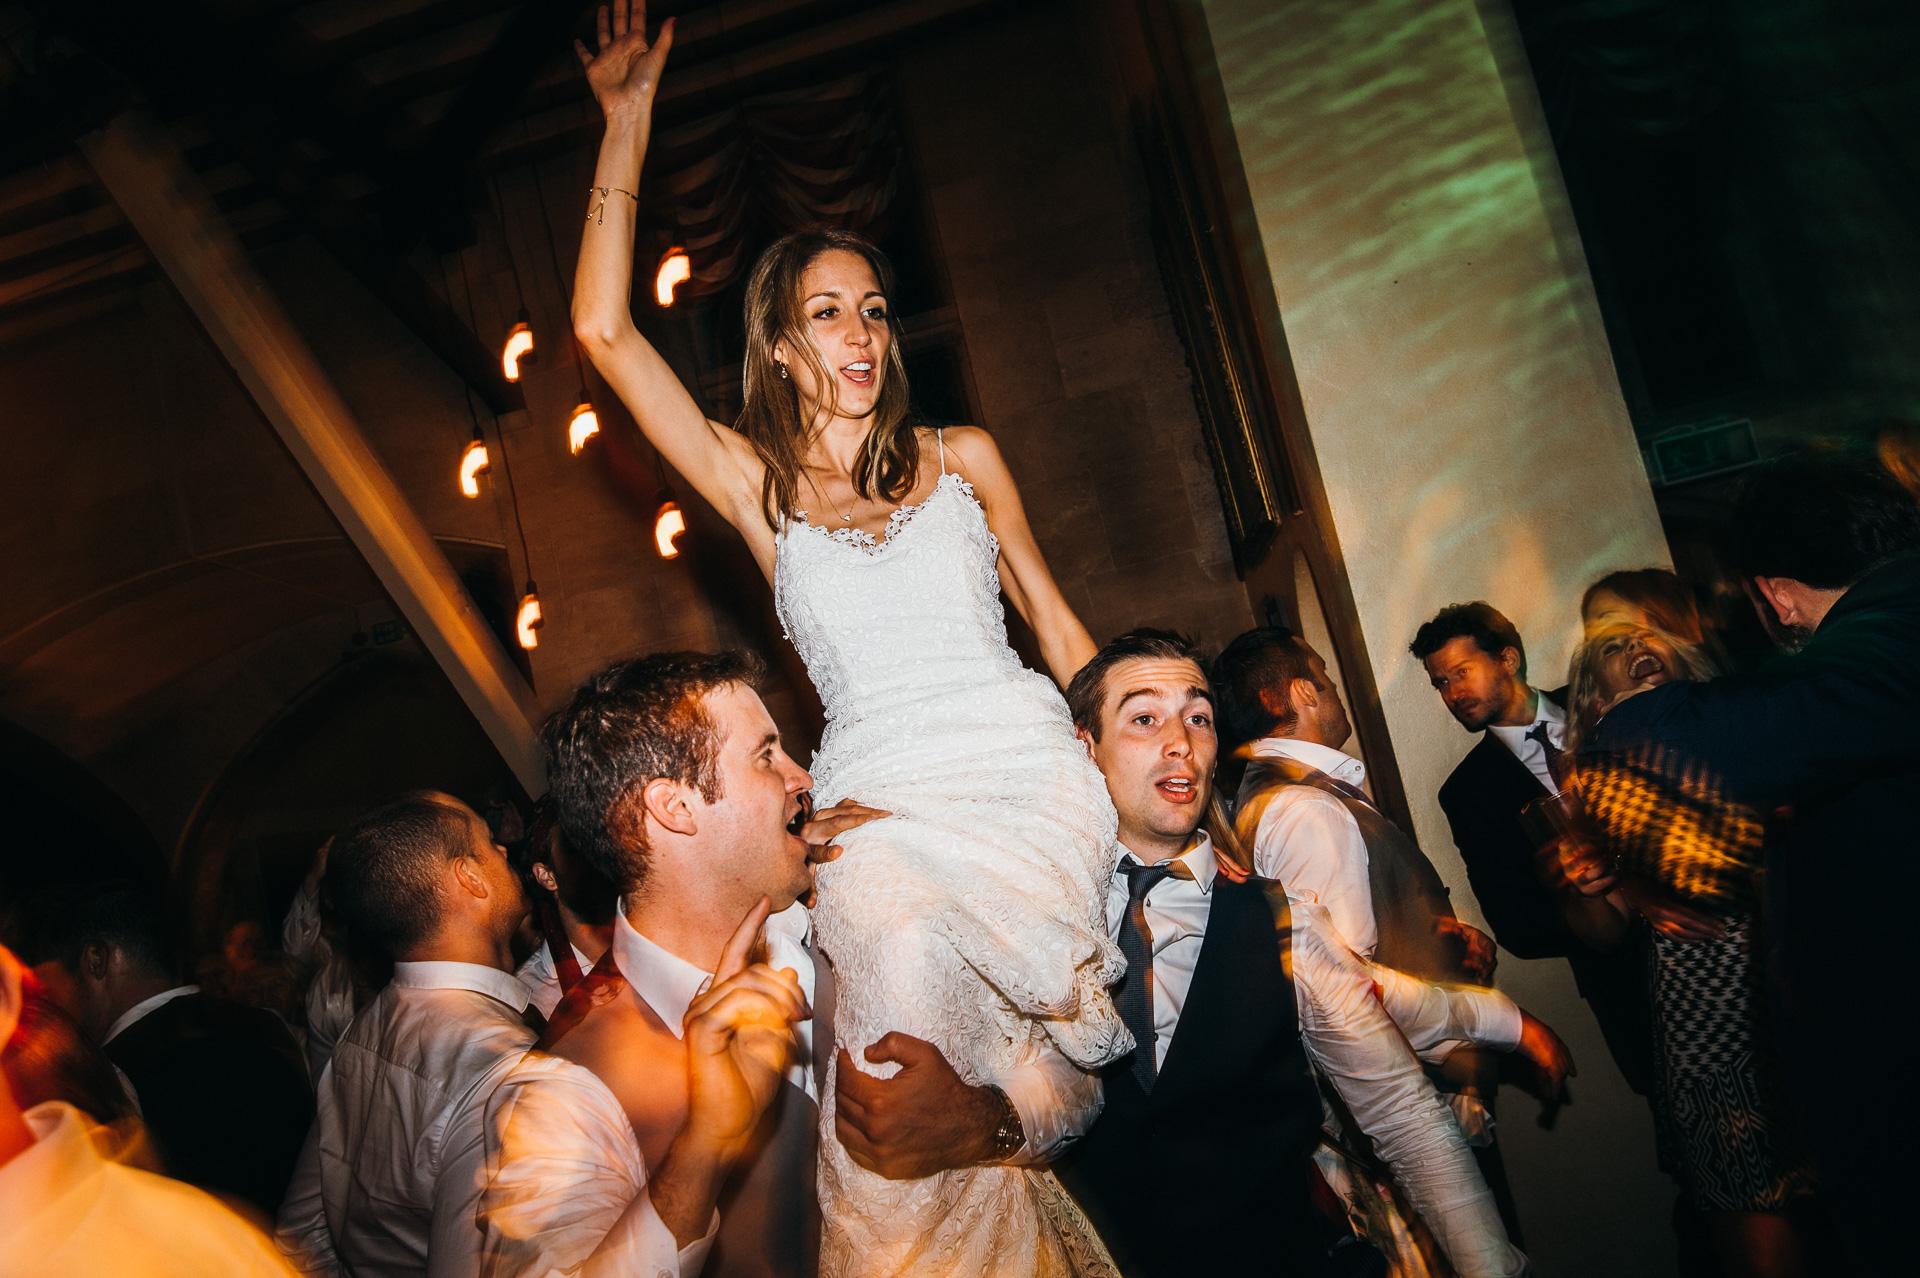 Sudeley castle dancing at wedding